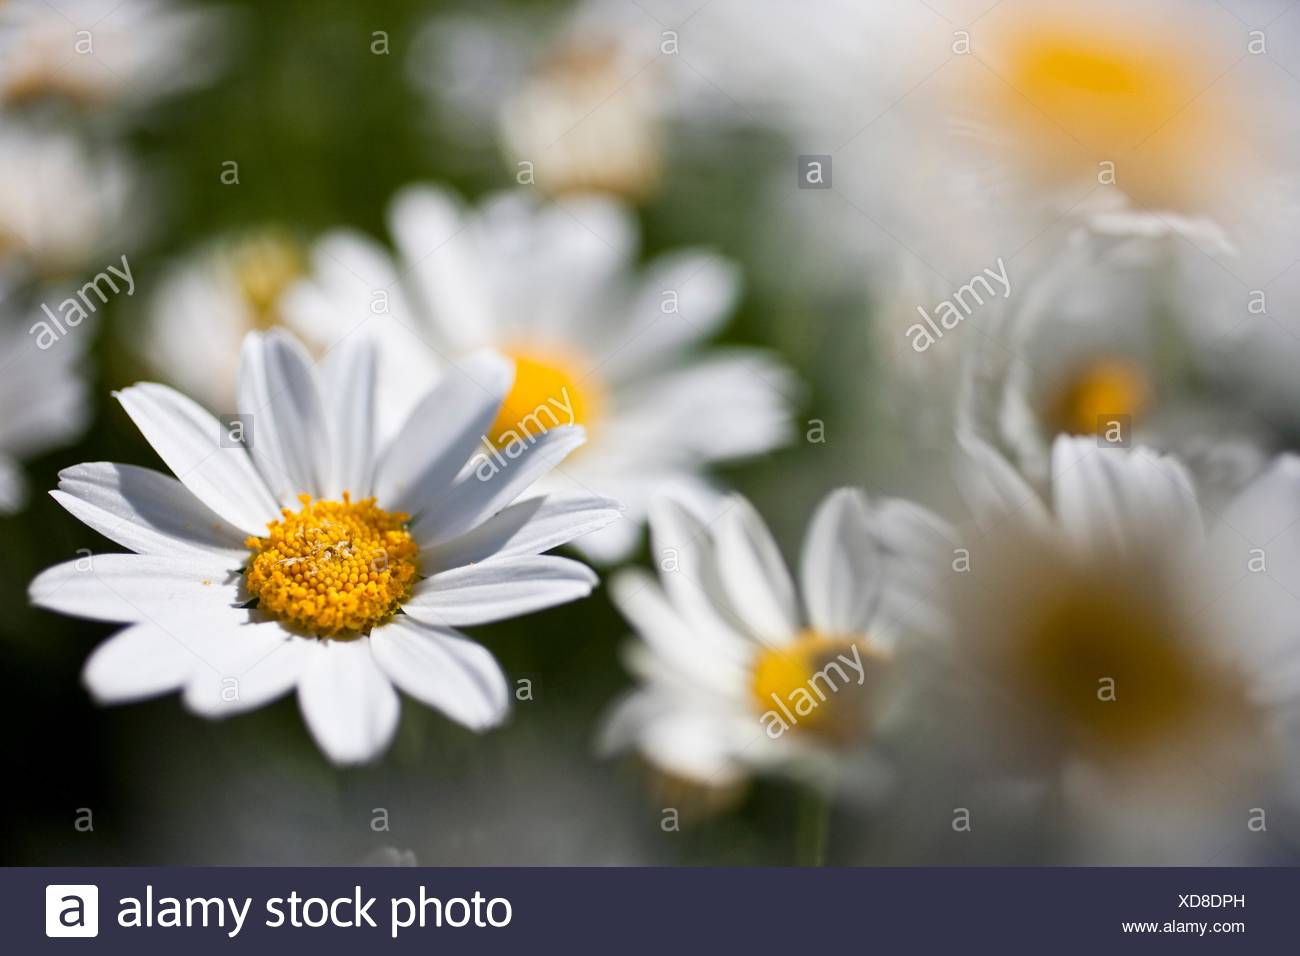 Garden with Anthemis maritima - Stock Image